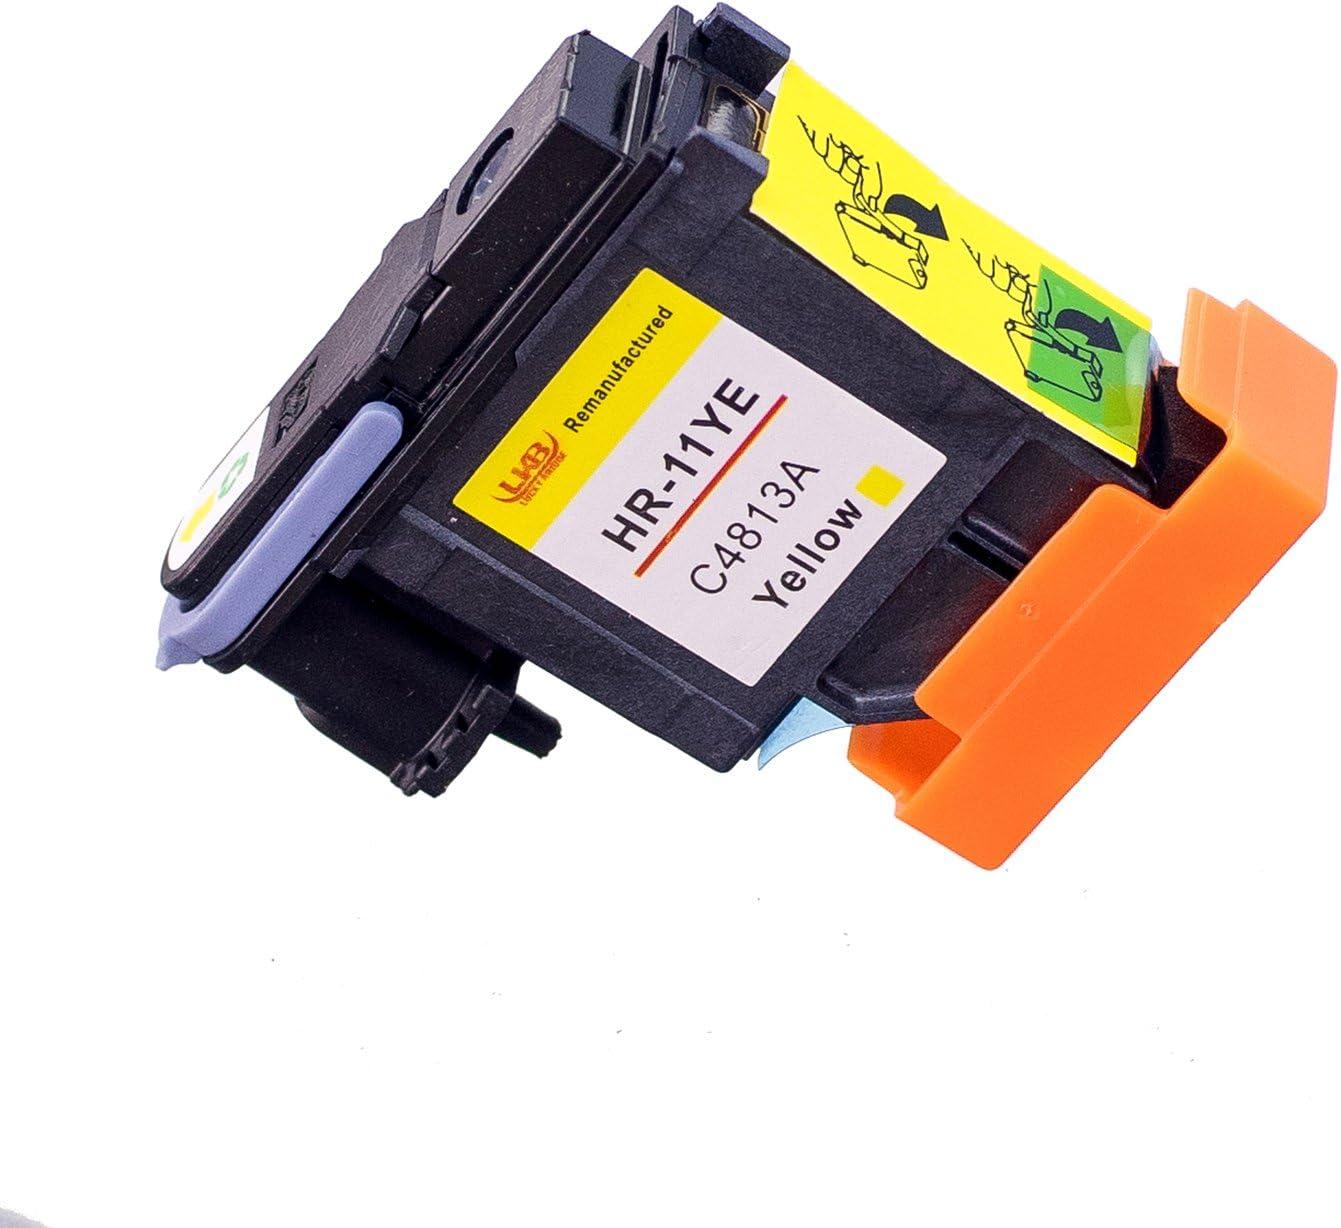 Lucky puente 1PK cabezal de impresión amarillo impresora HP11 C4813 A REMANUFACTURADO compatible para HP Business Inkjet 2200, 2250, 2280, 2600, 2800 HP Designjet 110 NR, Designjet 10PS, 20PS, 50PS, 500 800 Impresoras (1 YE): Amazon.es: Oficina y papelería